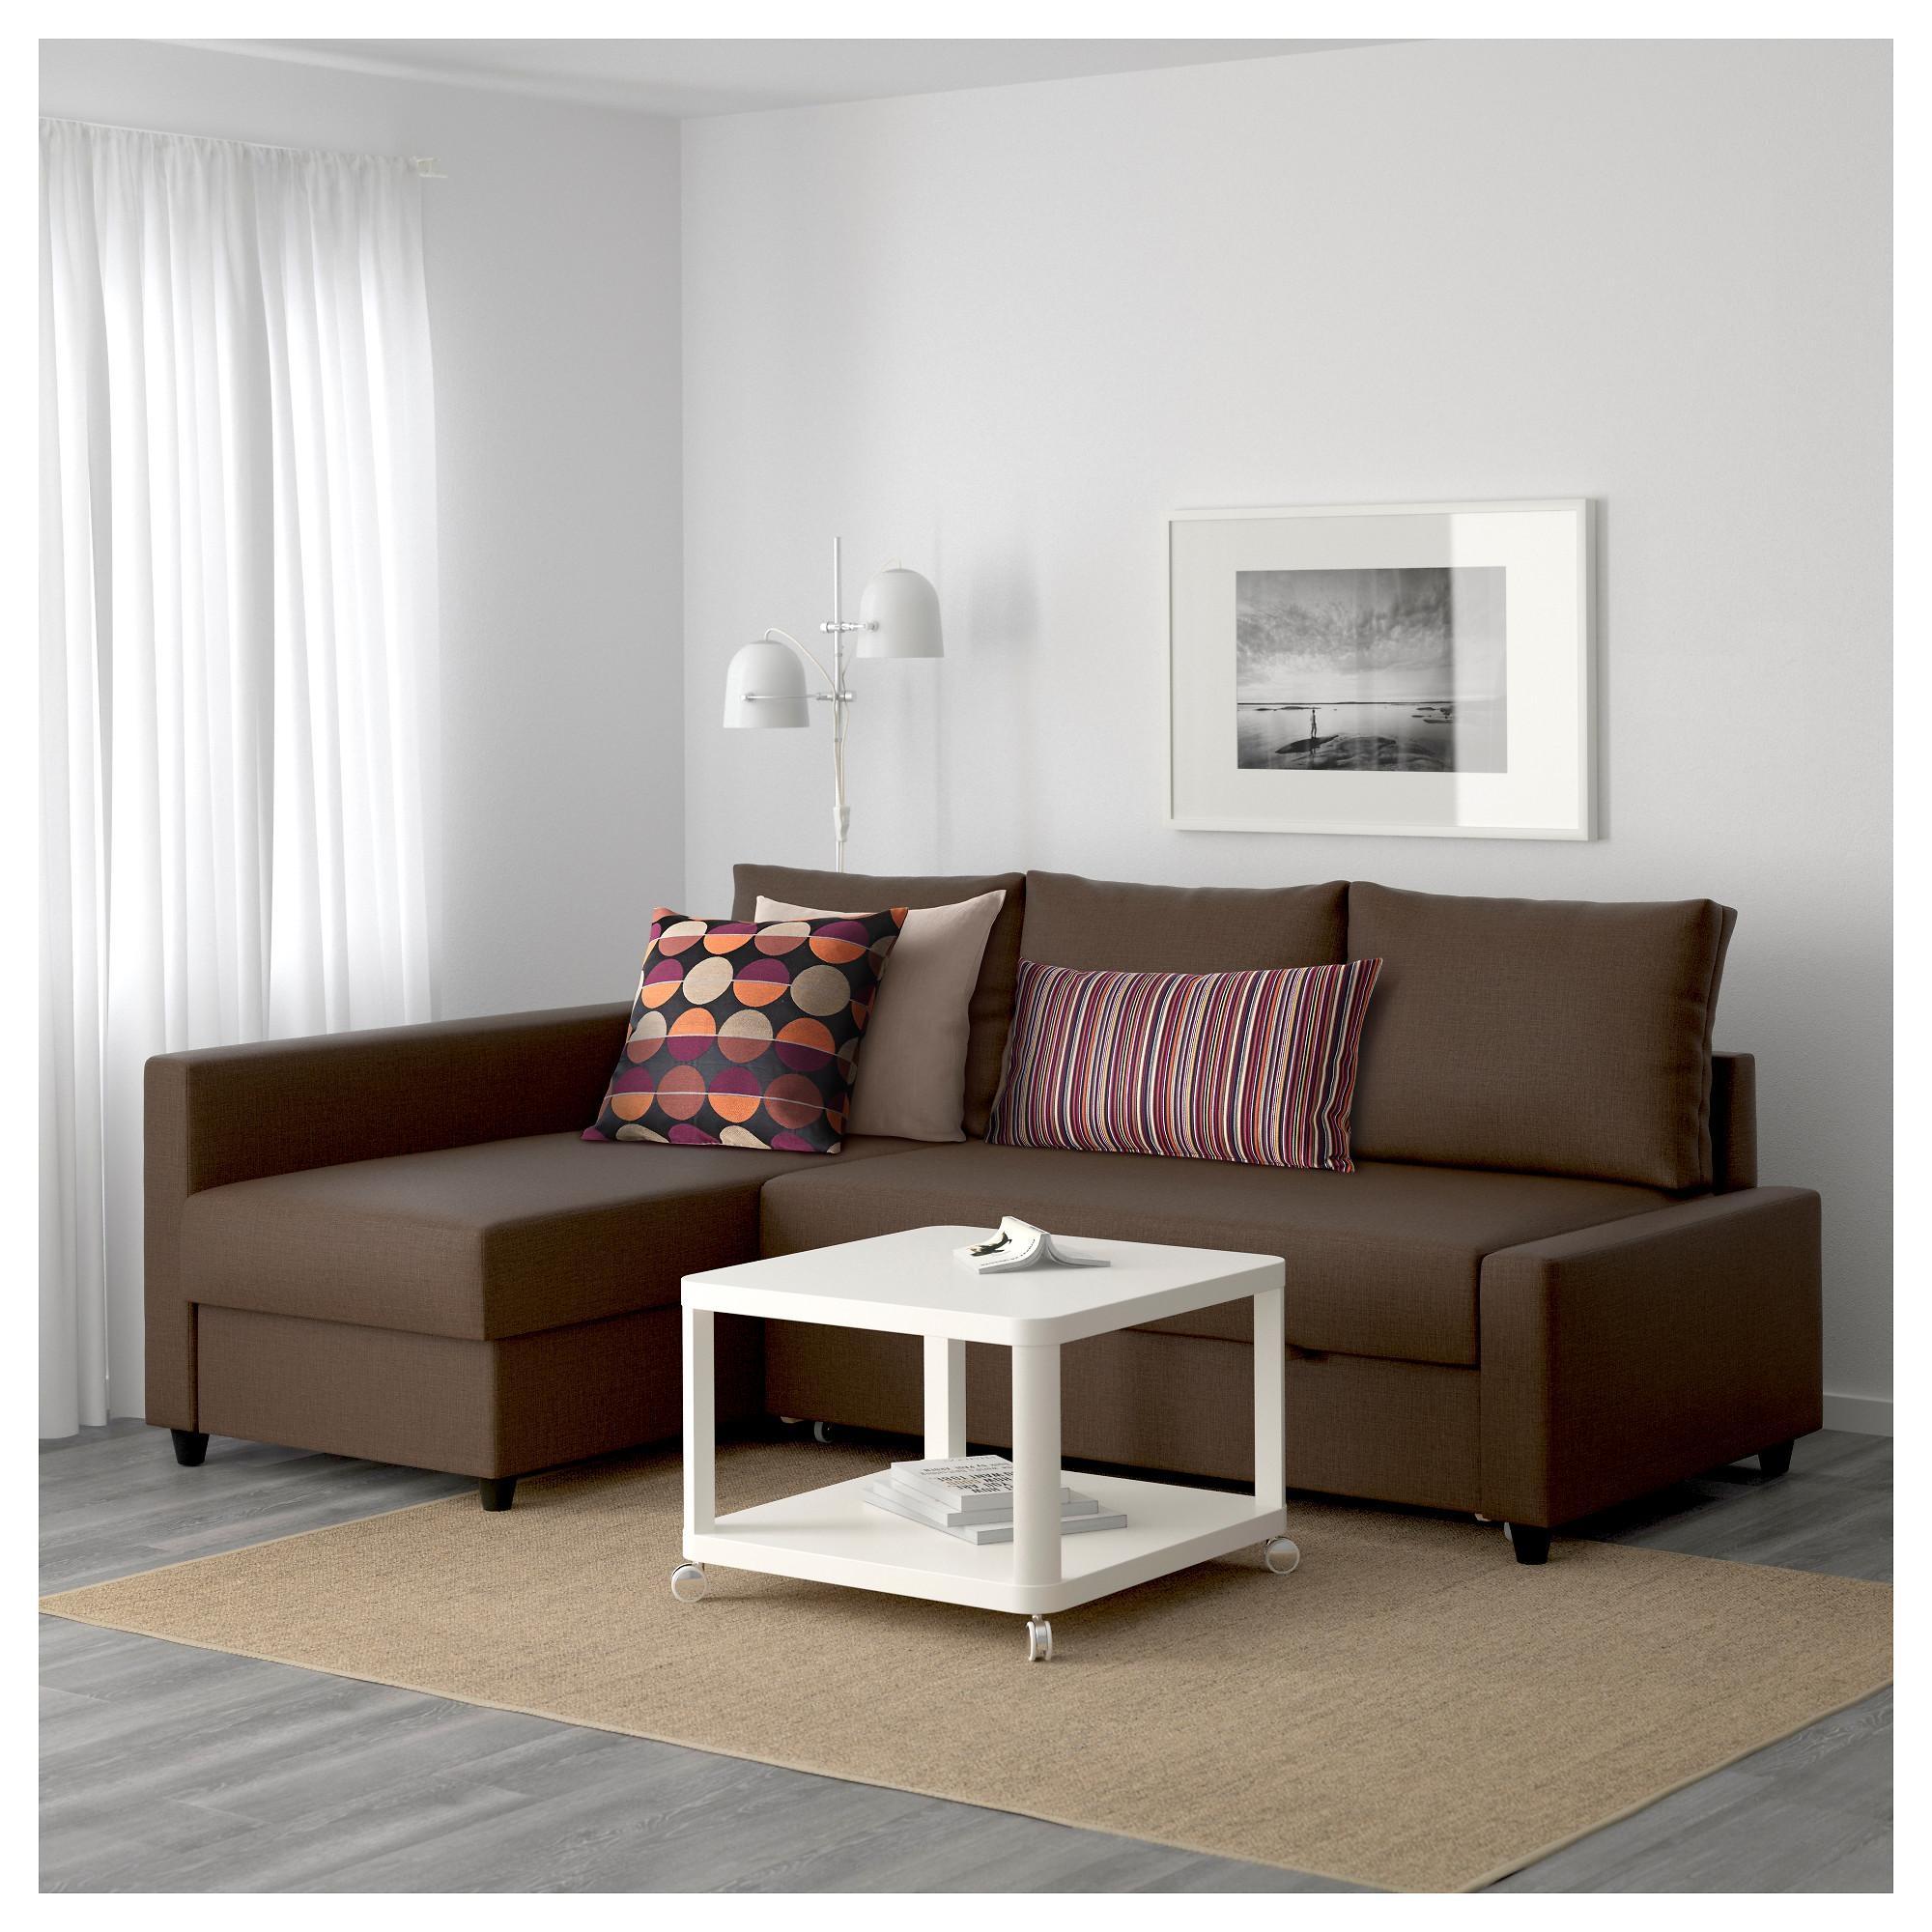 Friheten Corner Sofa Bed With Storage Skiftebo Brown – Ikea With Regard To Storage Sofa Ikea (Image 5 of 20)